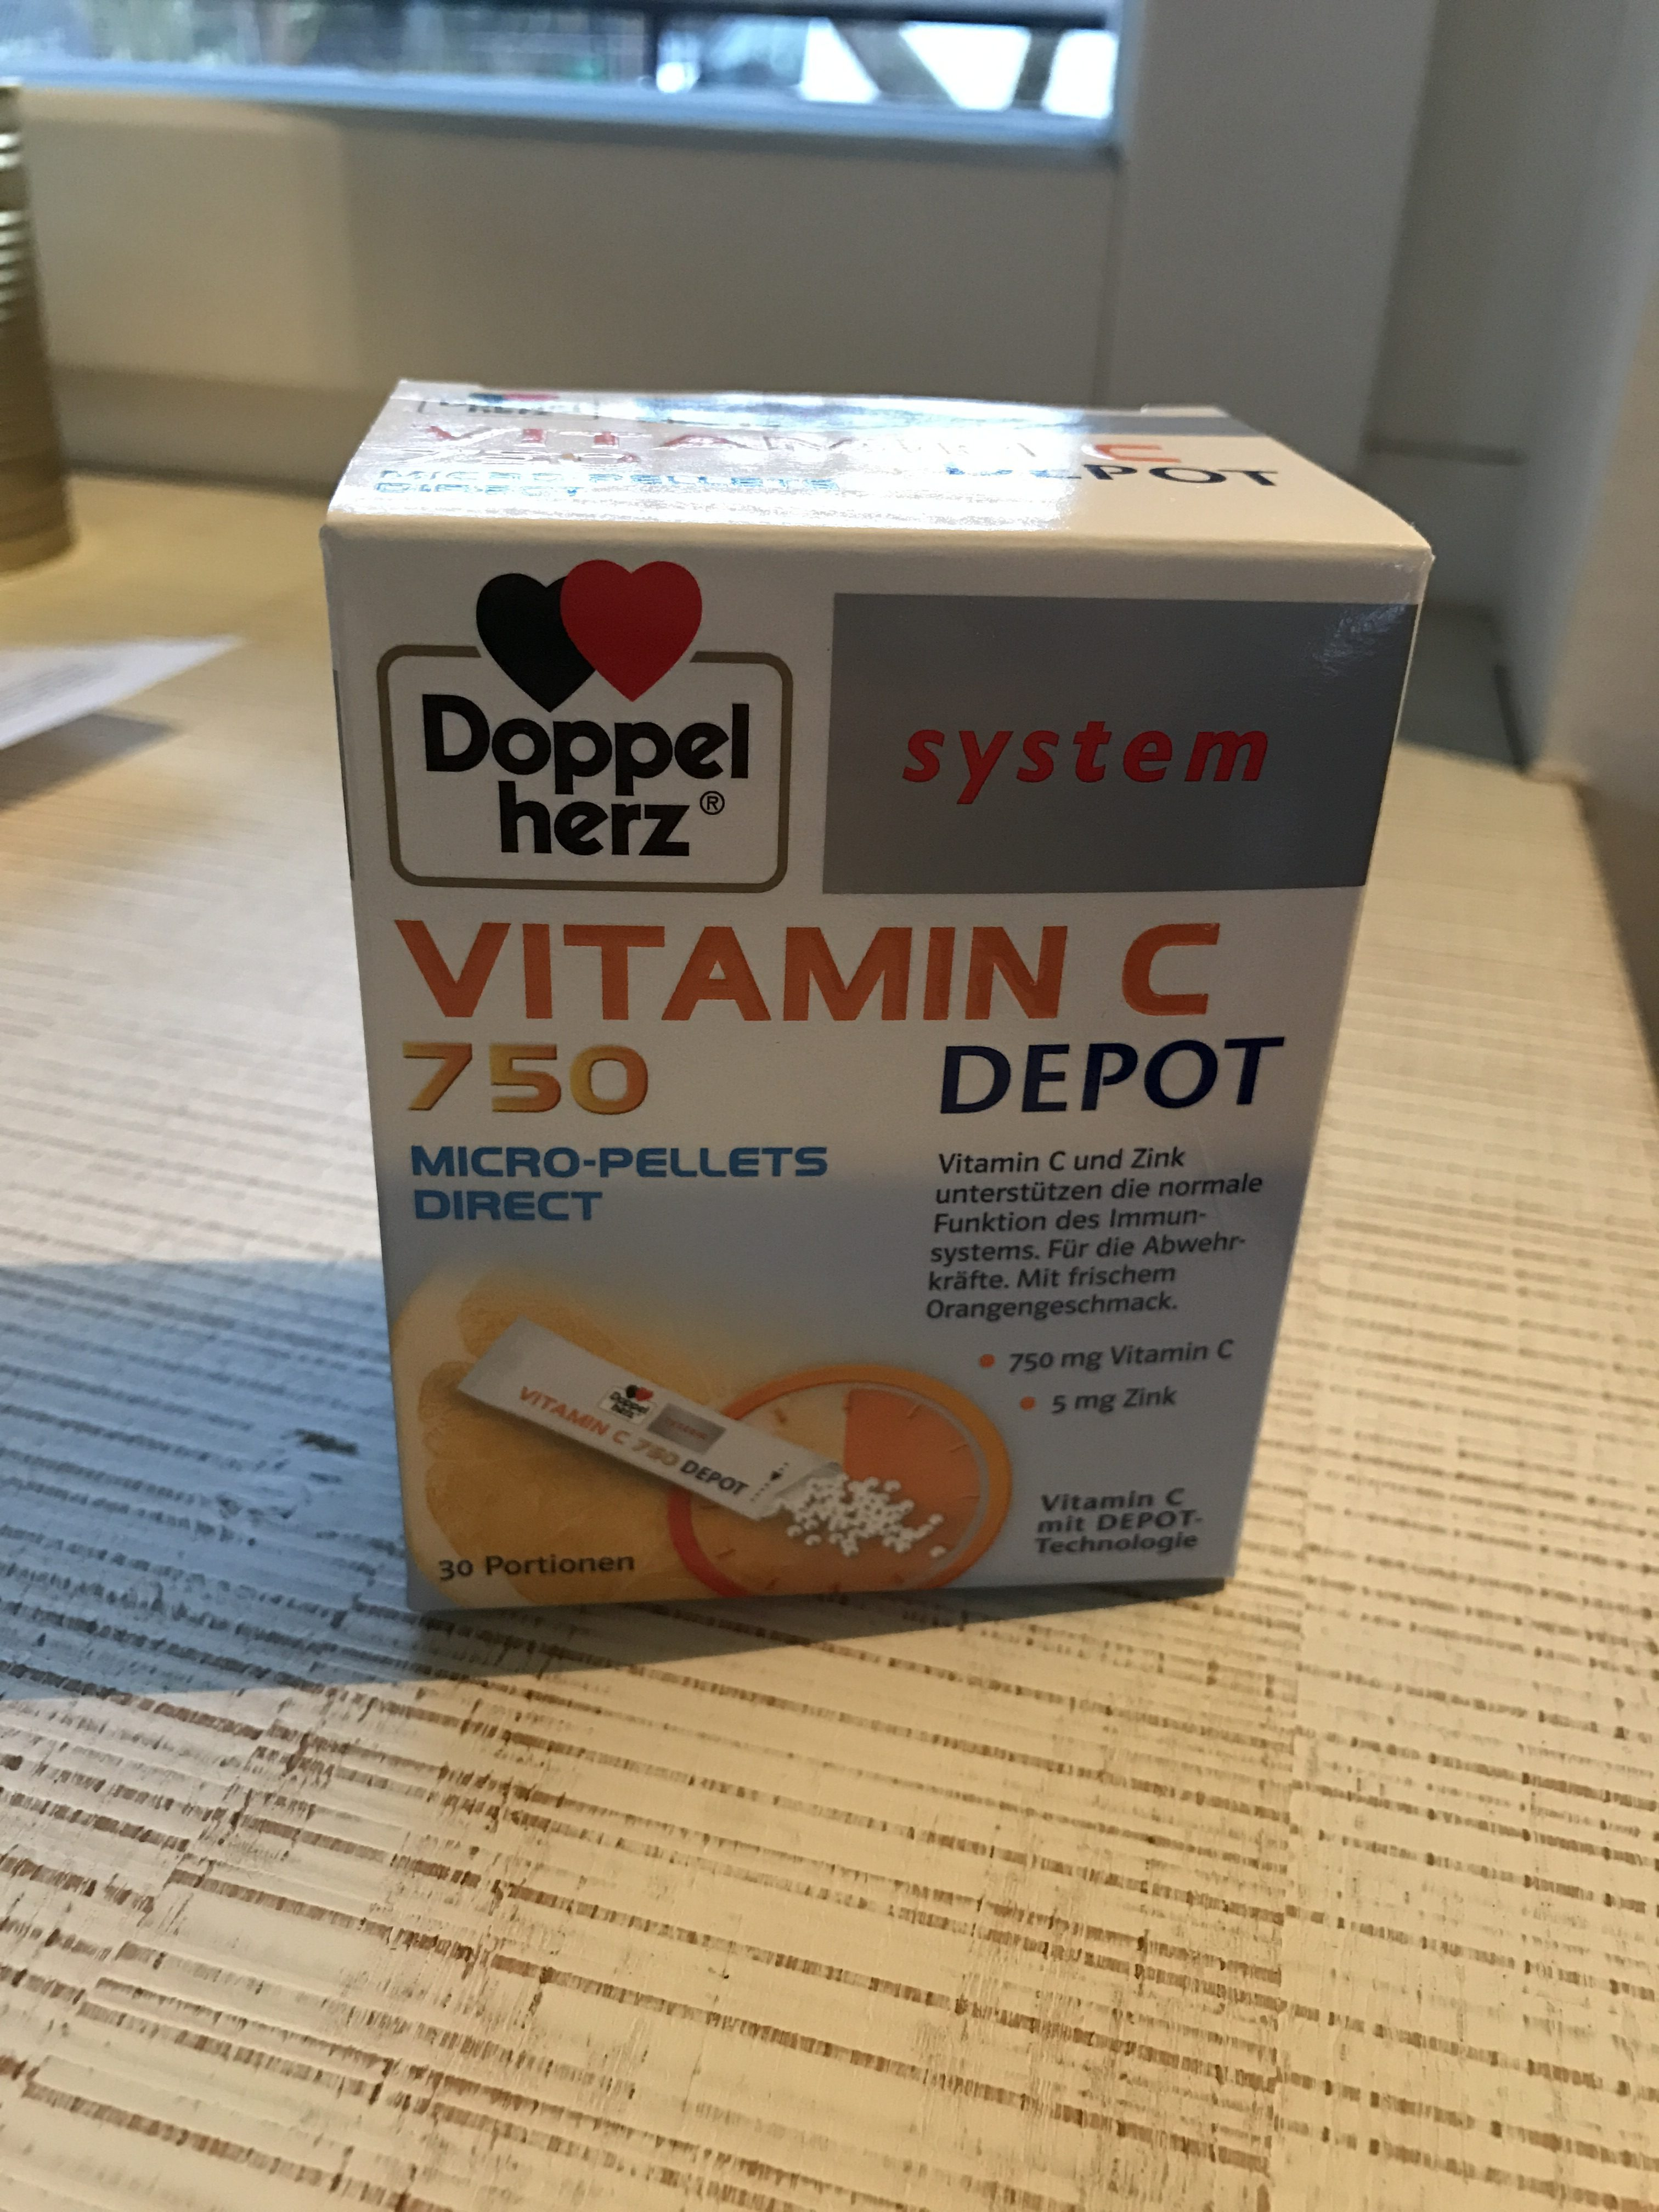 Produkttest Doppelherz system Vitamin C Depot